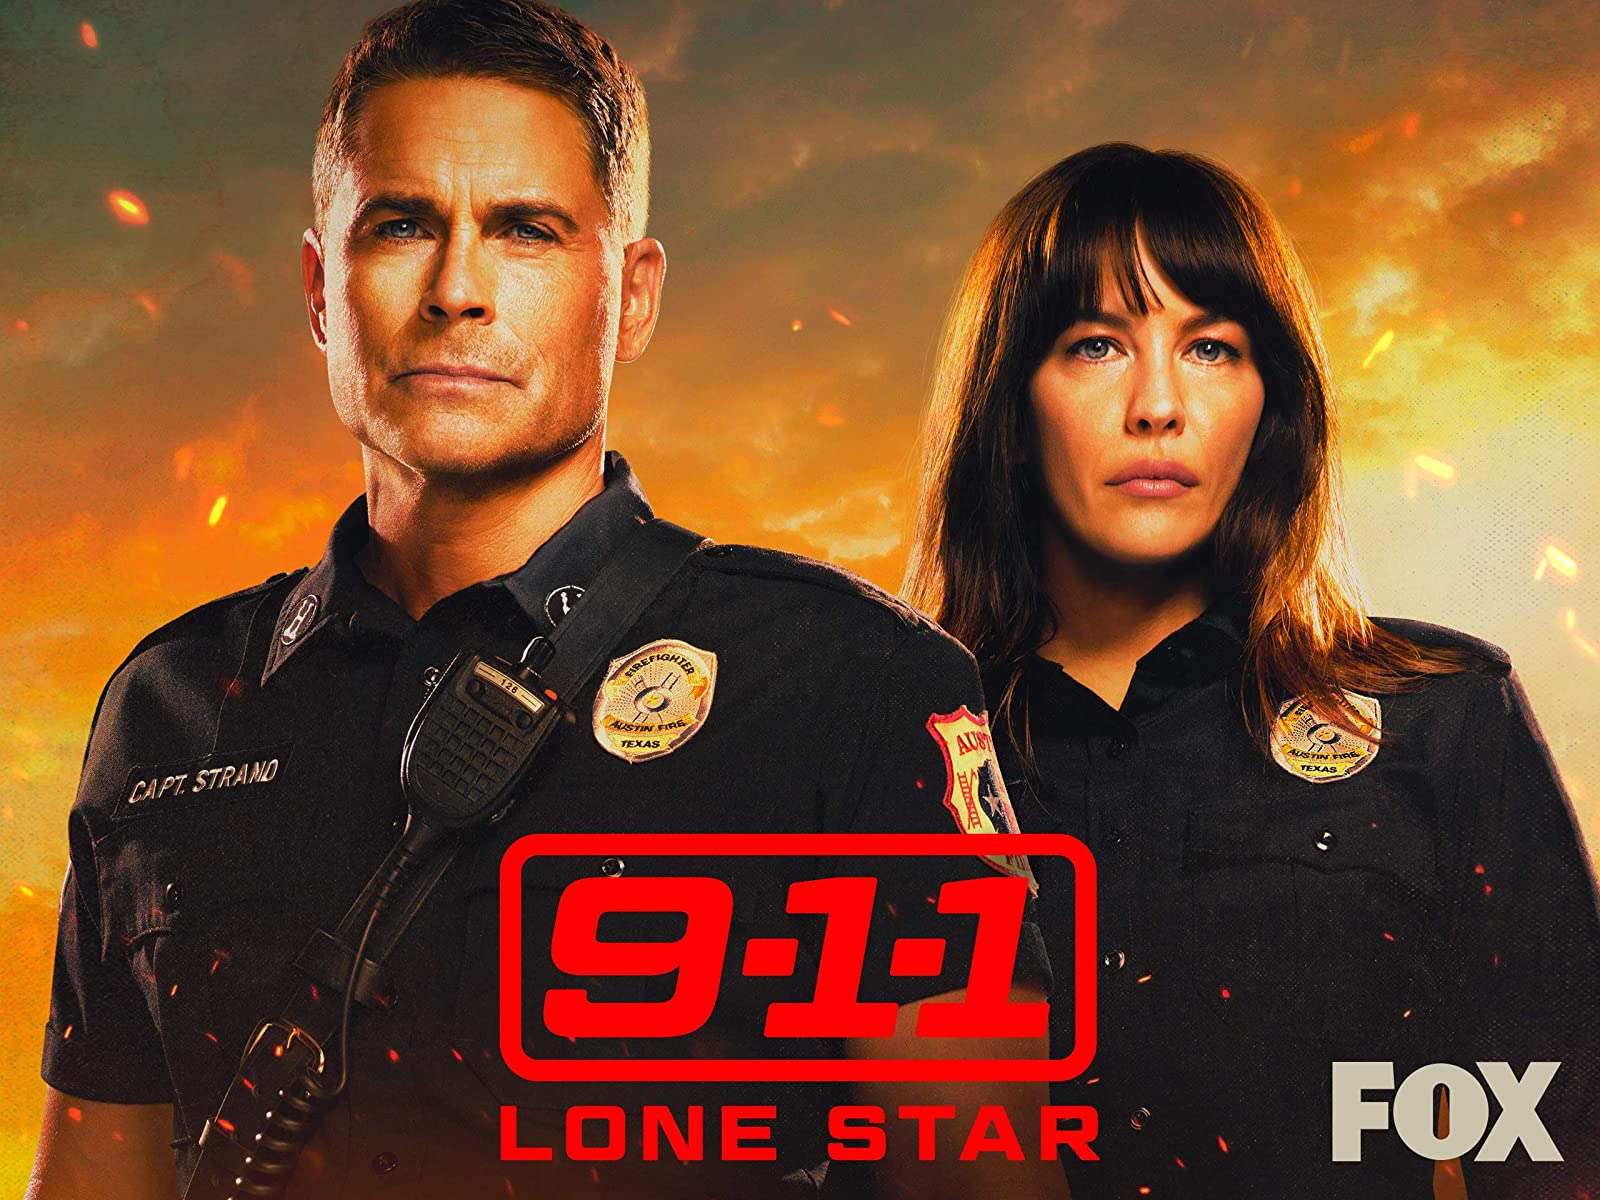 9 1 1 season 2 episode 16 online free